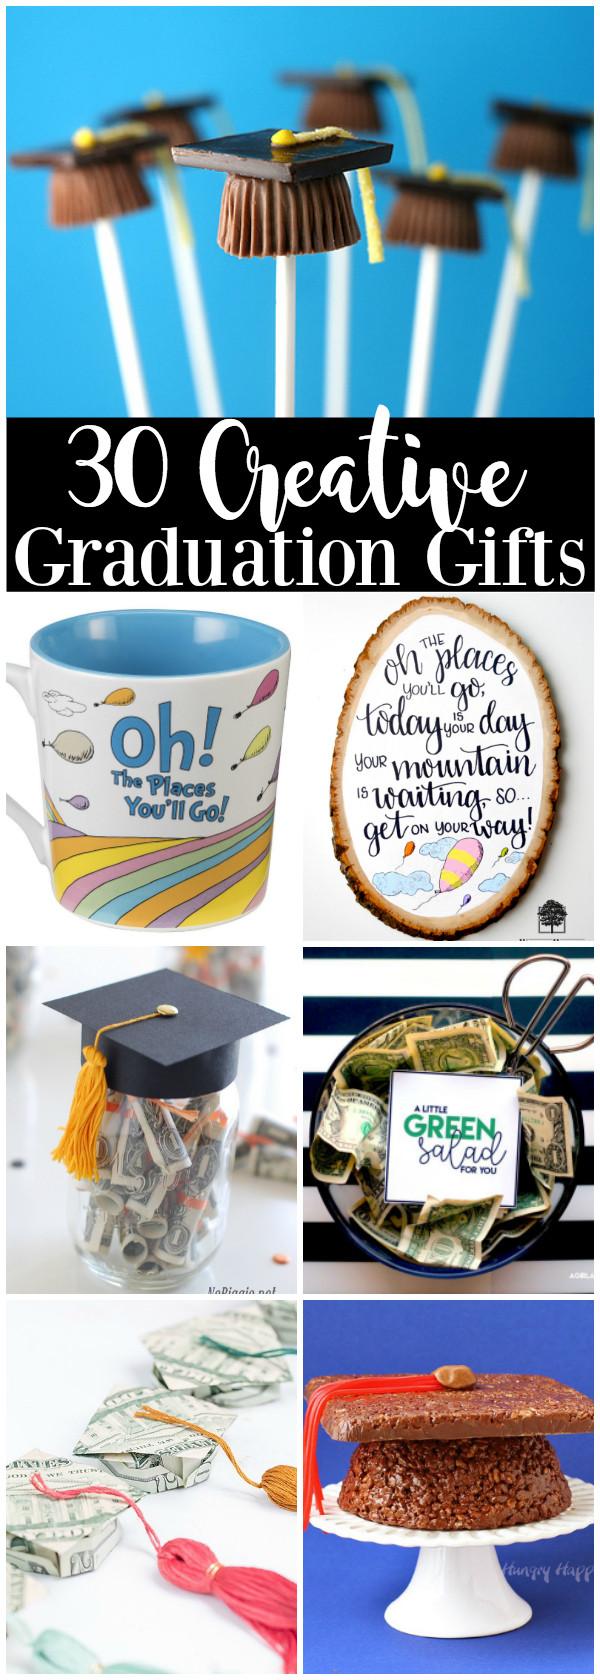 Gift Ideas For Graduation  30 Creative Graduation Gift Ideas